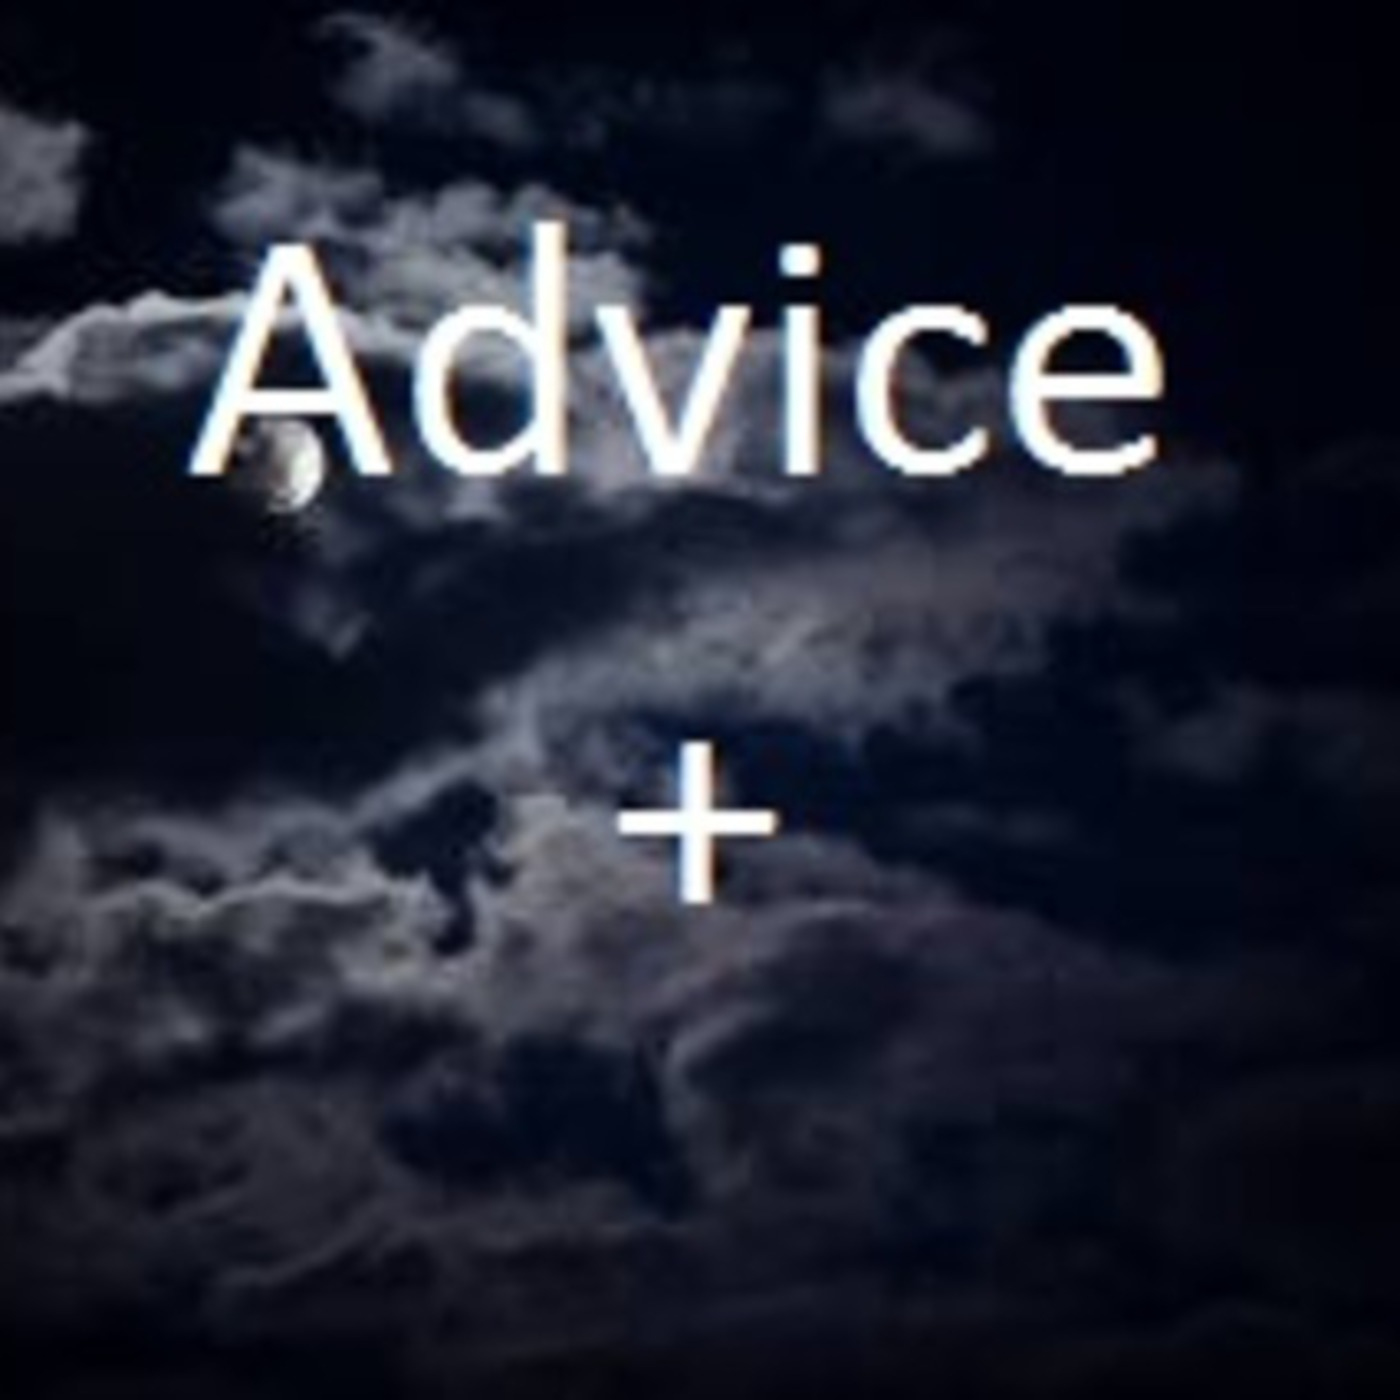 Advice+